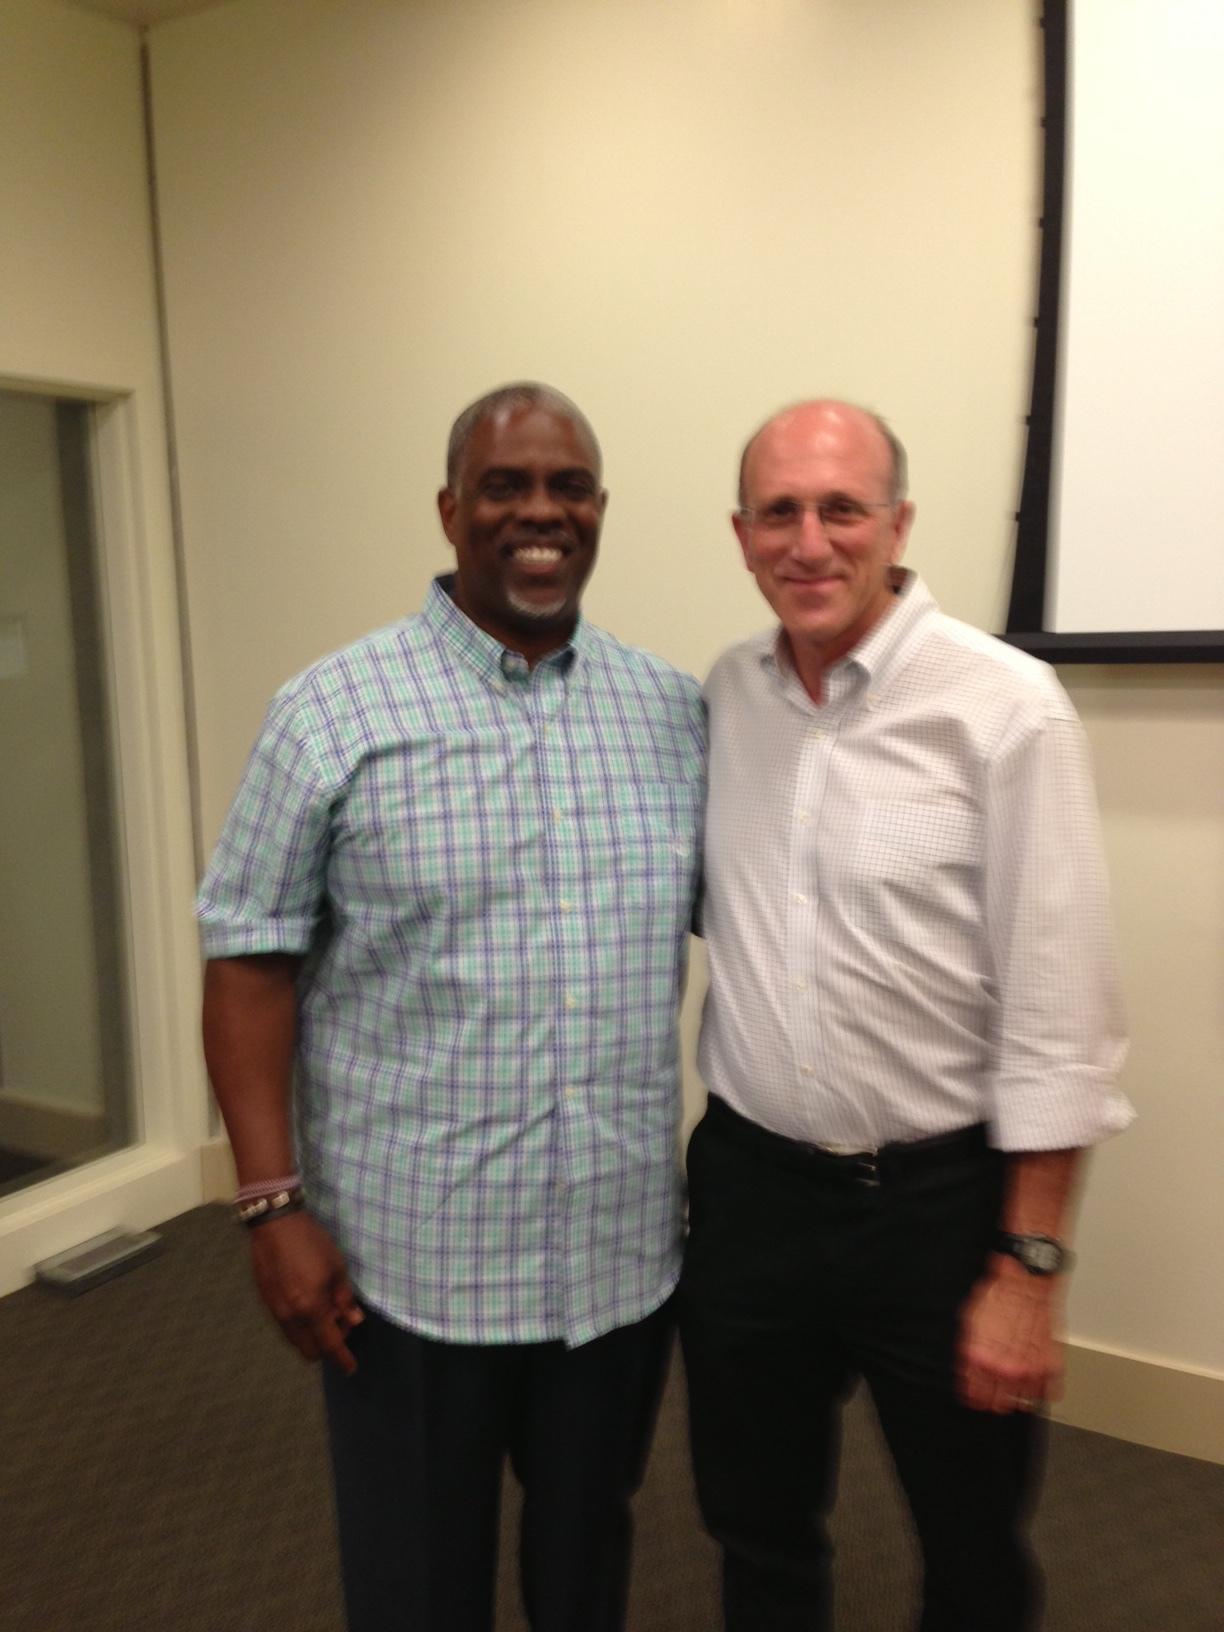 Professor Mark T. Harris, Esq. with Councilman Jay Schenirer of Sacramento